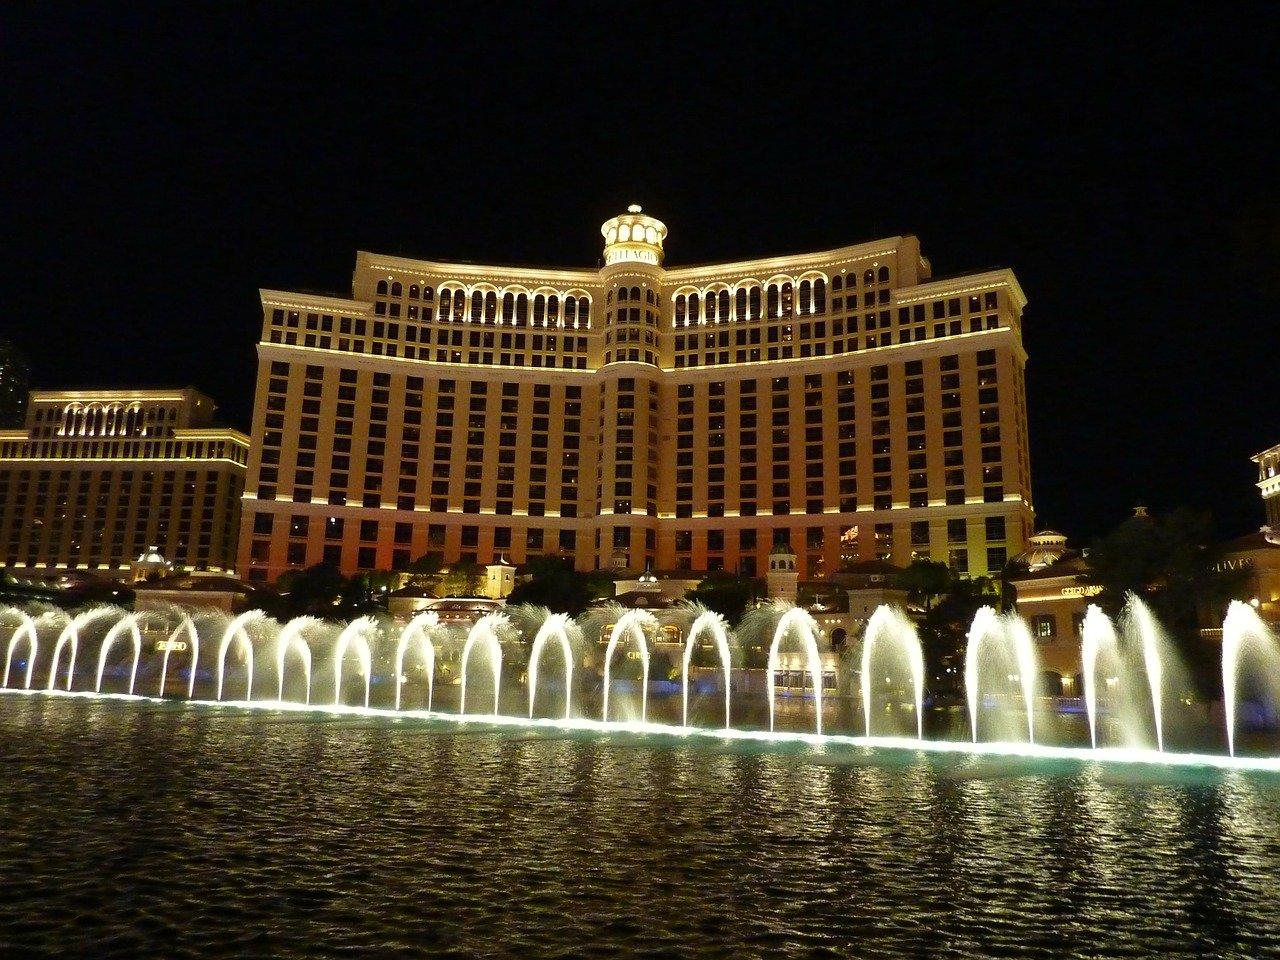 Las Vegas Bellagio Casino Springbrunnen